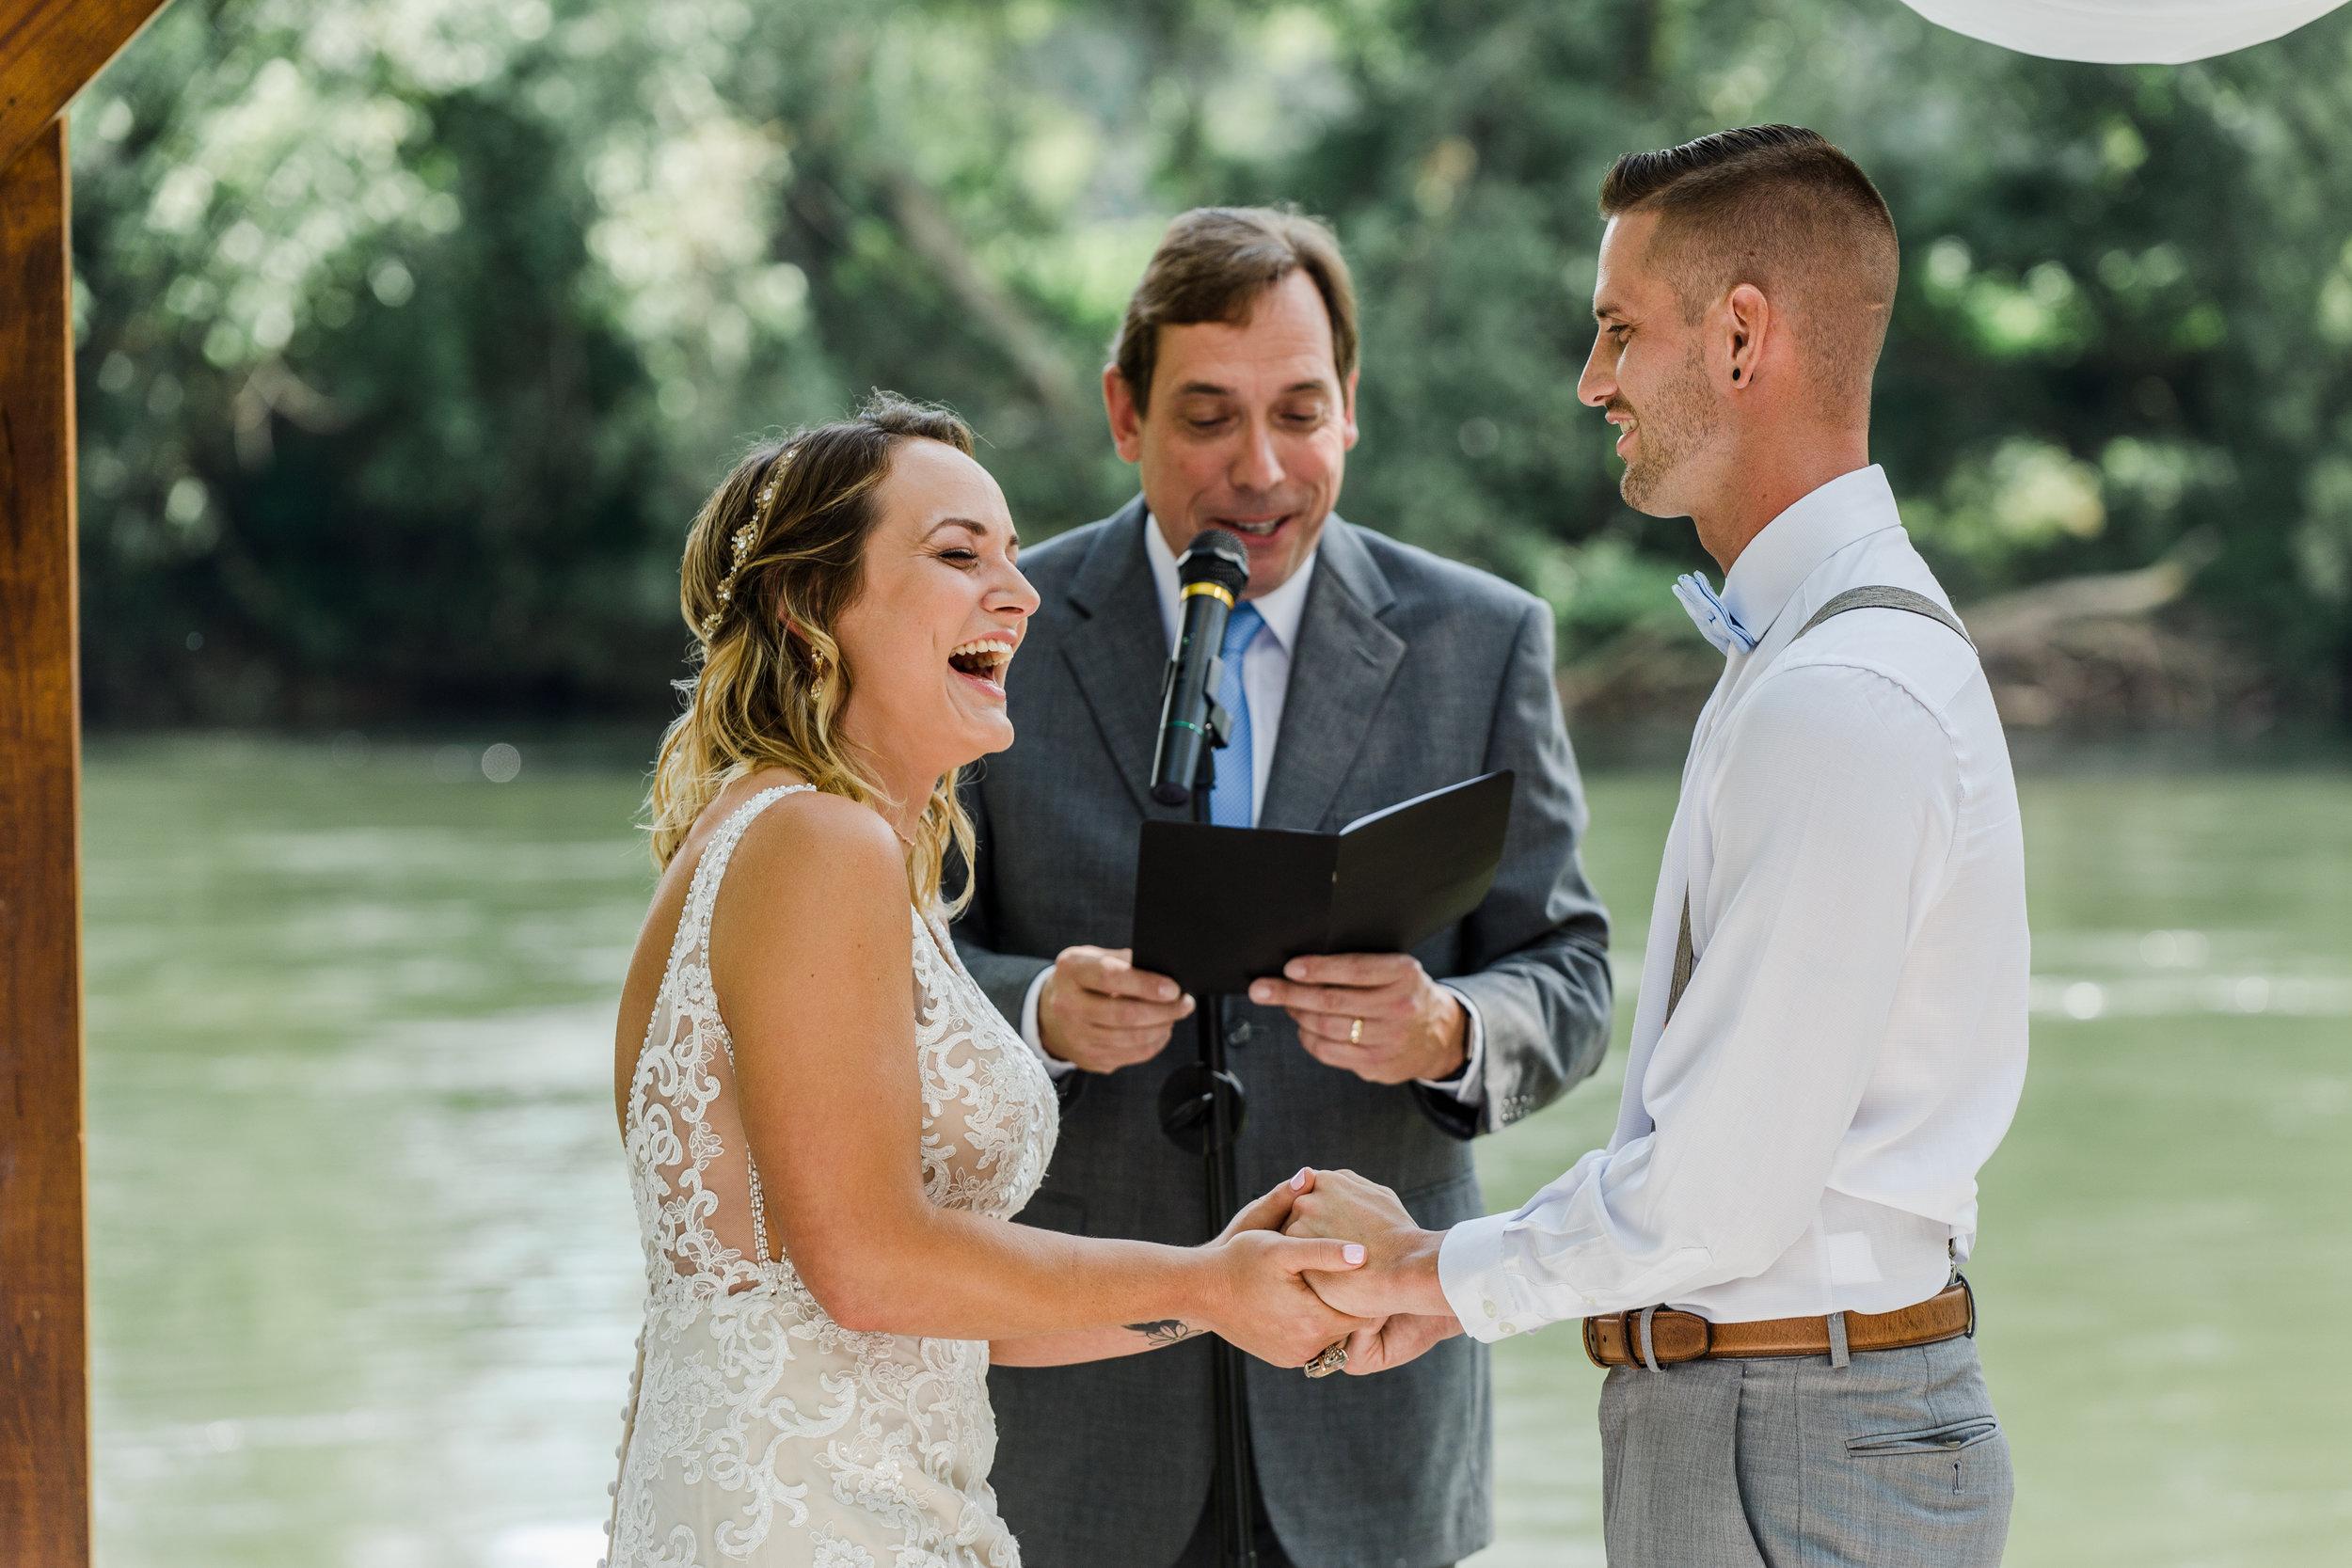 SARAH + CHASE - Hiwassee River Weddings & Events, Delano, TN